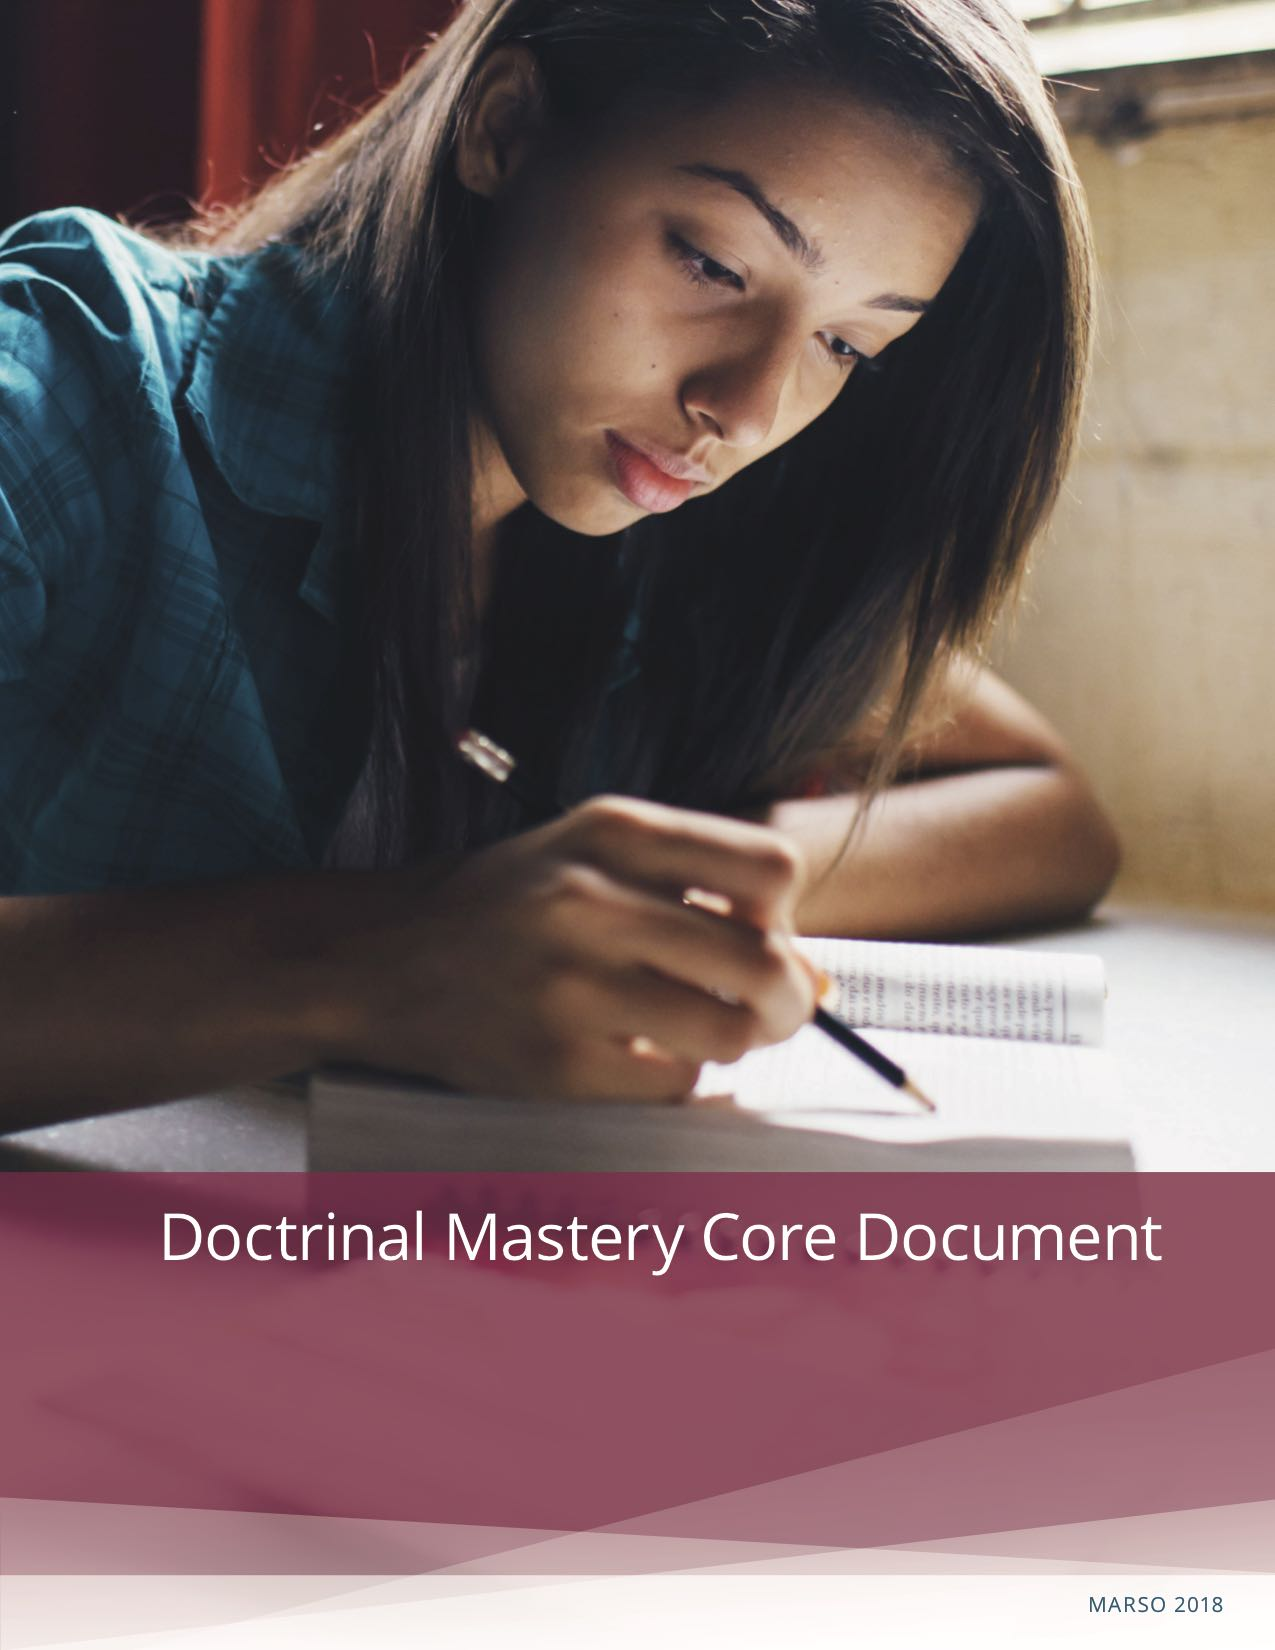 Pabalat ng Doctrinal Mastery Core Document